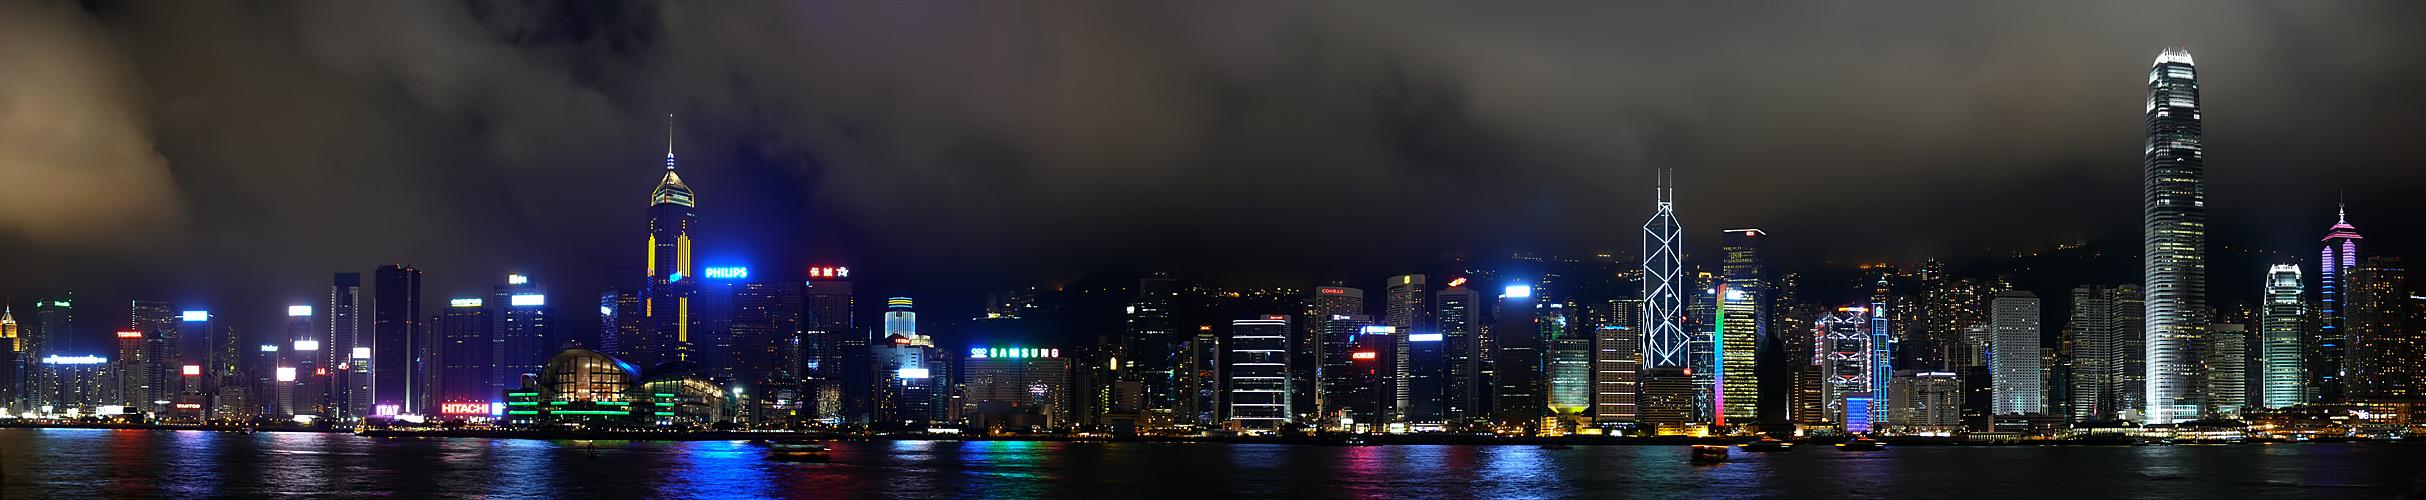 Lights of Hong Kong